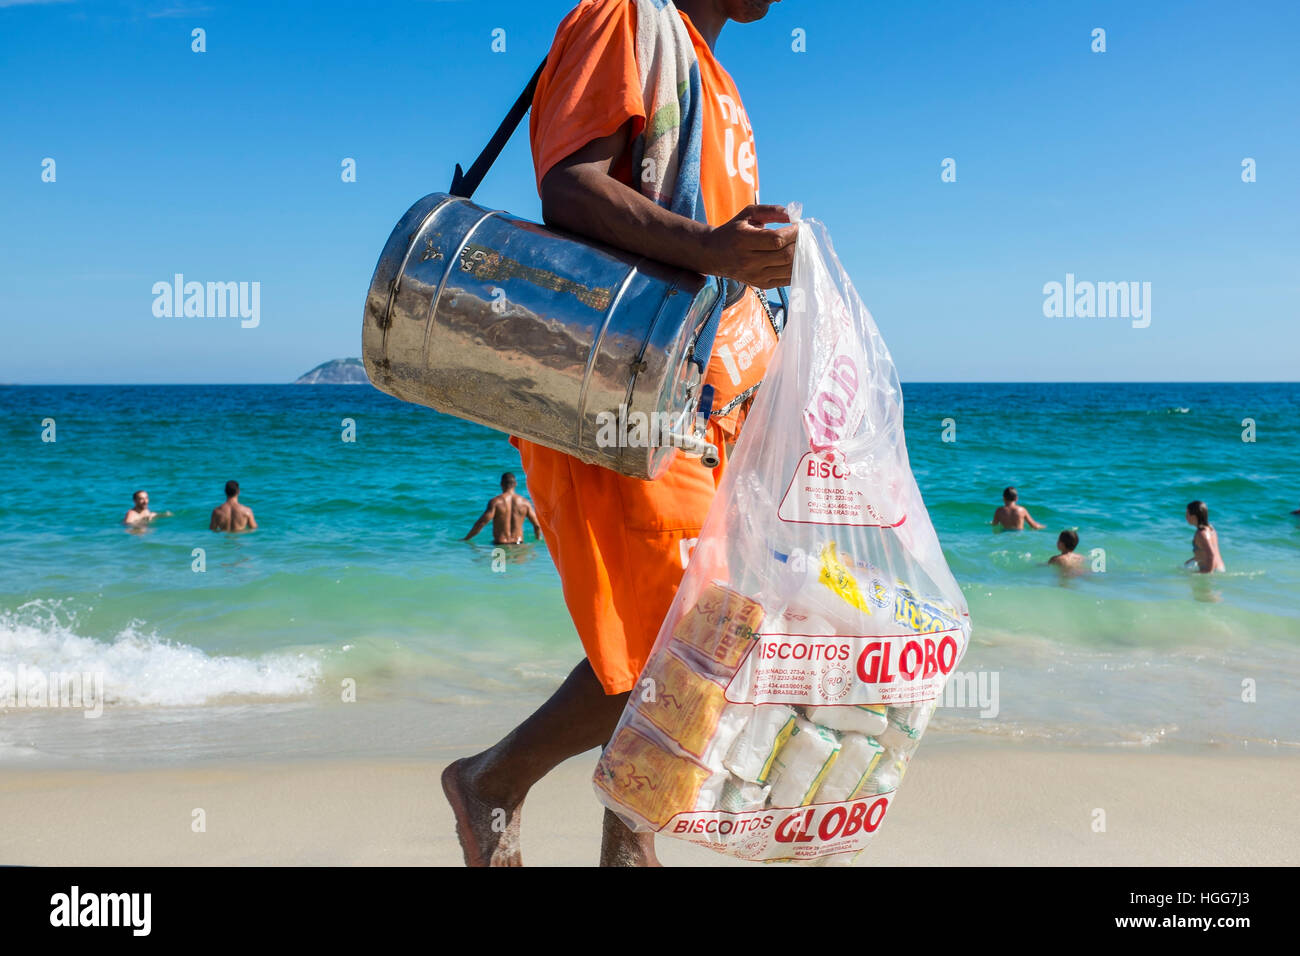 Atemberaubend RIO DE JANEIRO - 26. Februar 2016: Strand Verkäufer verkaufen Mate #BF_16